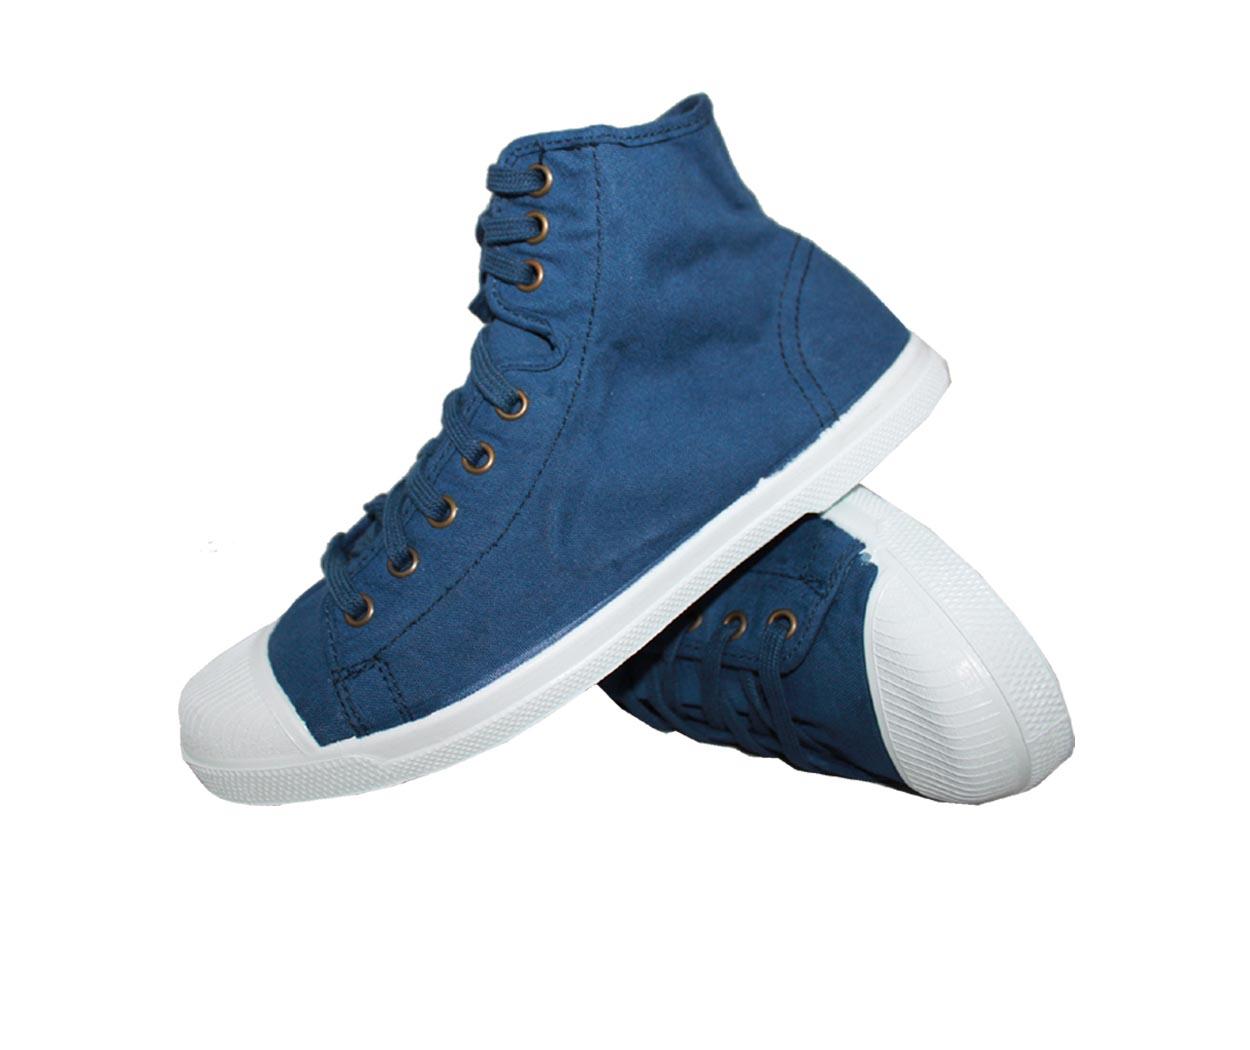 chaussure femme bota sport azul chaussures natural world. Black Bedroom Furniture Sets. Home Design Ideas